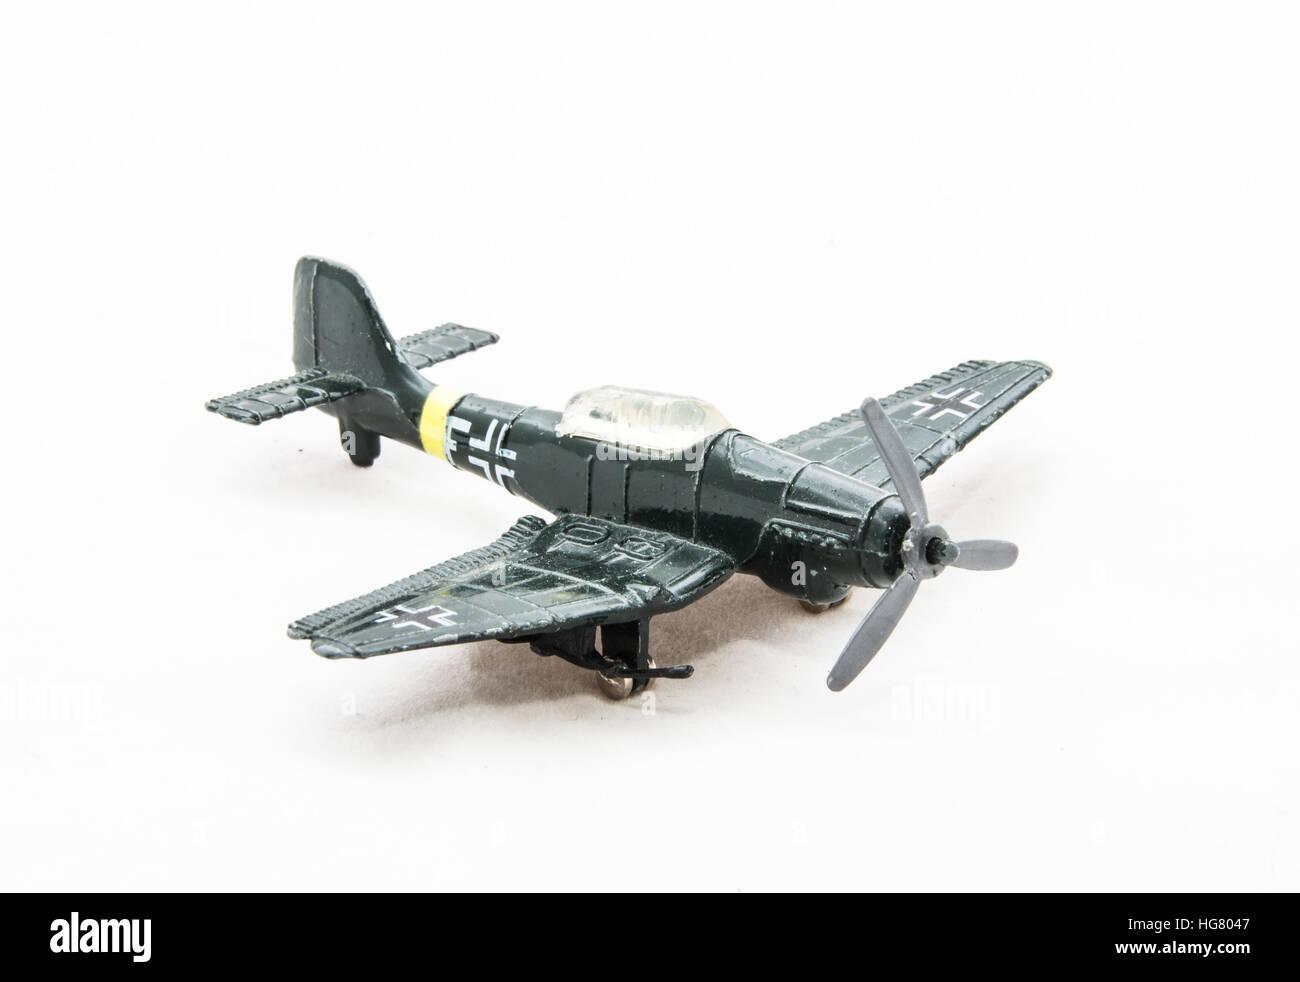 Dusty German World War II Toy Plane - Stock Image